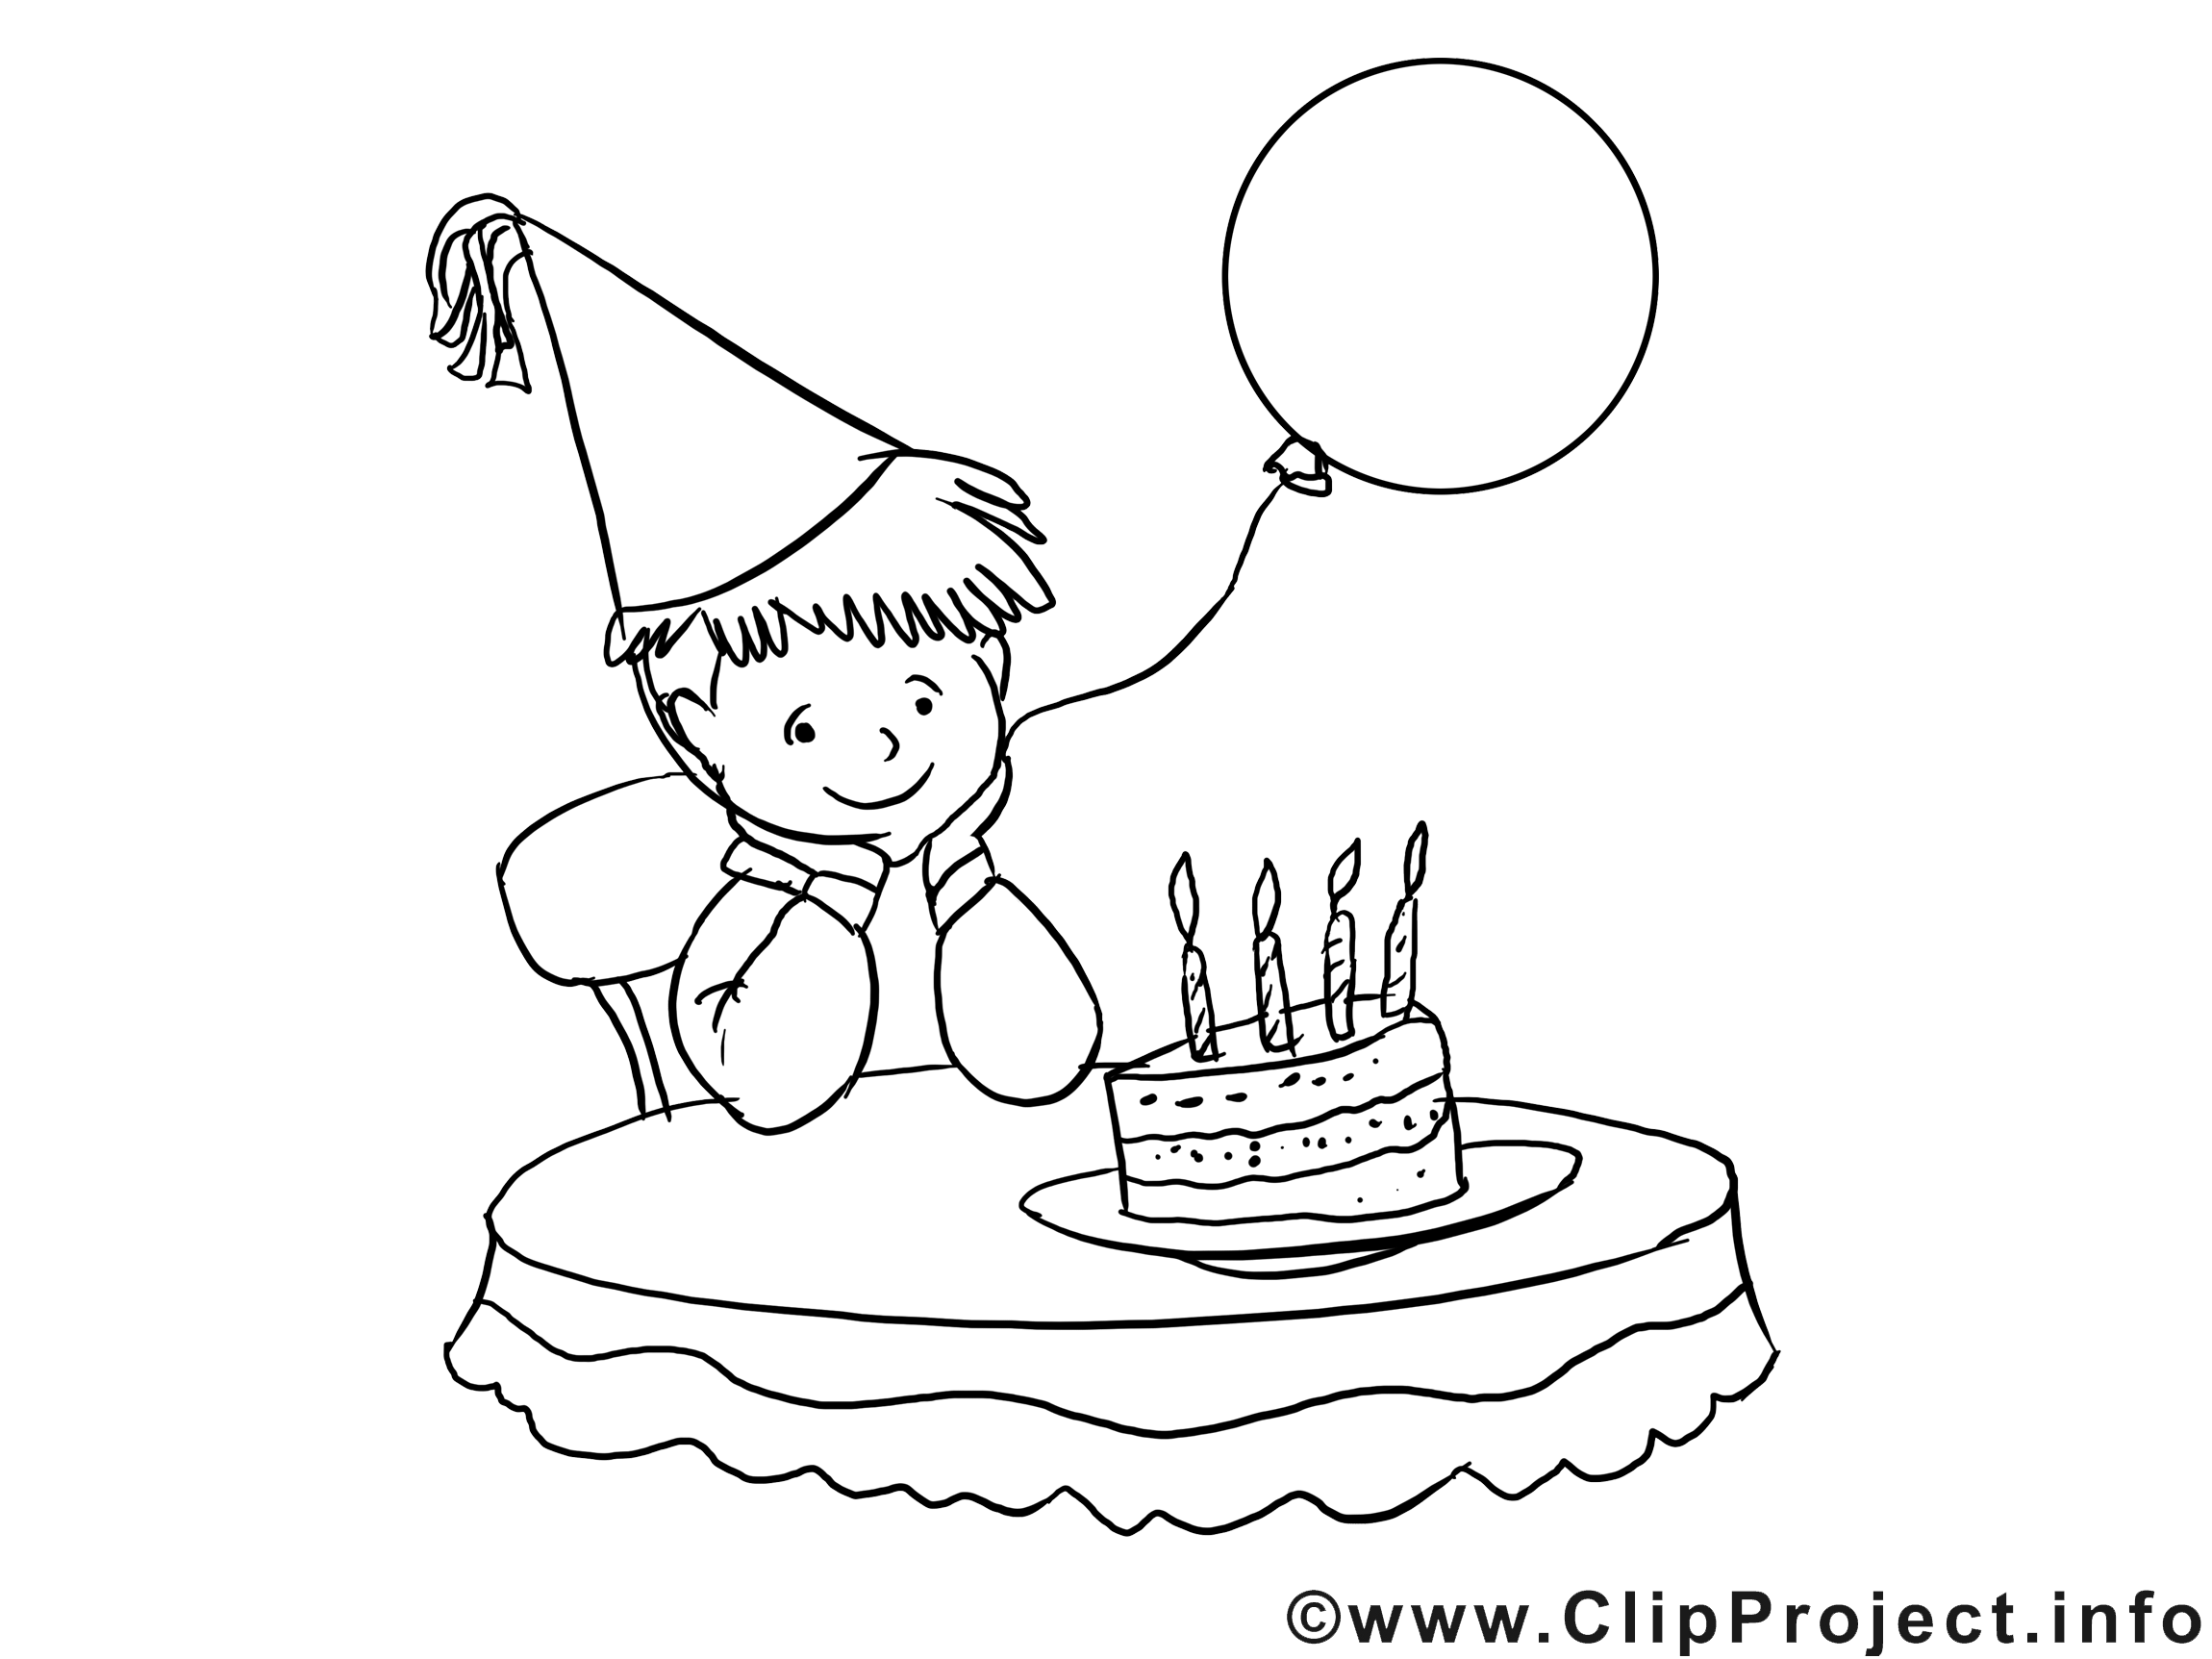 Ausmalbilder Geburtstag Hello Kitty : Tolle Hallo Kitty Geburtstag Malvorlagen Ideen Malvorlagen Von